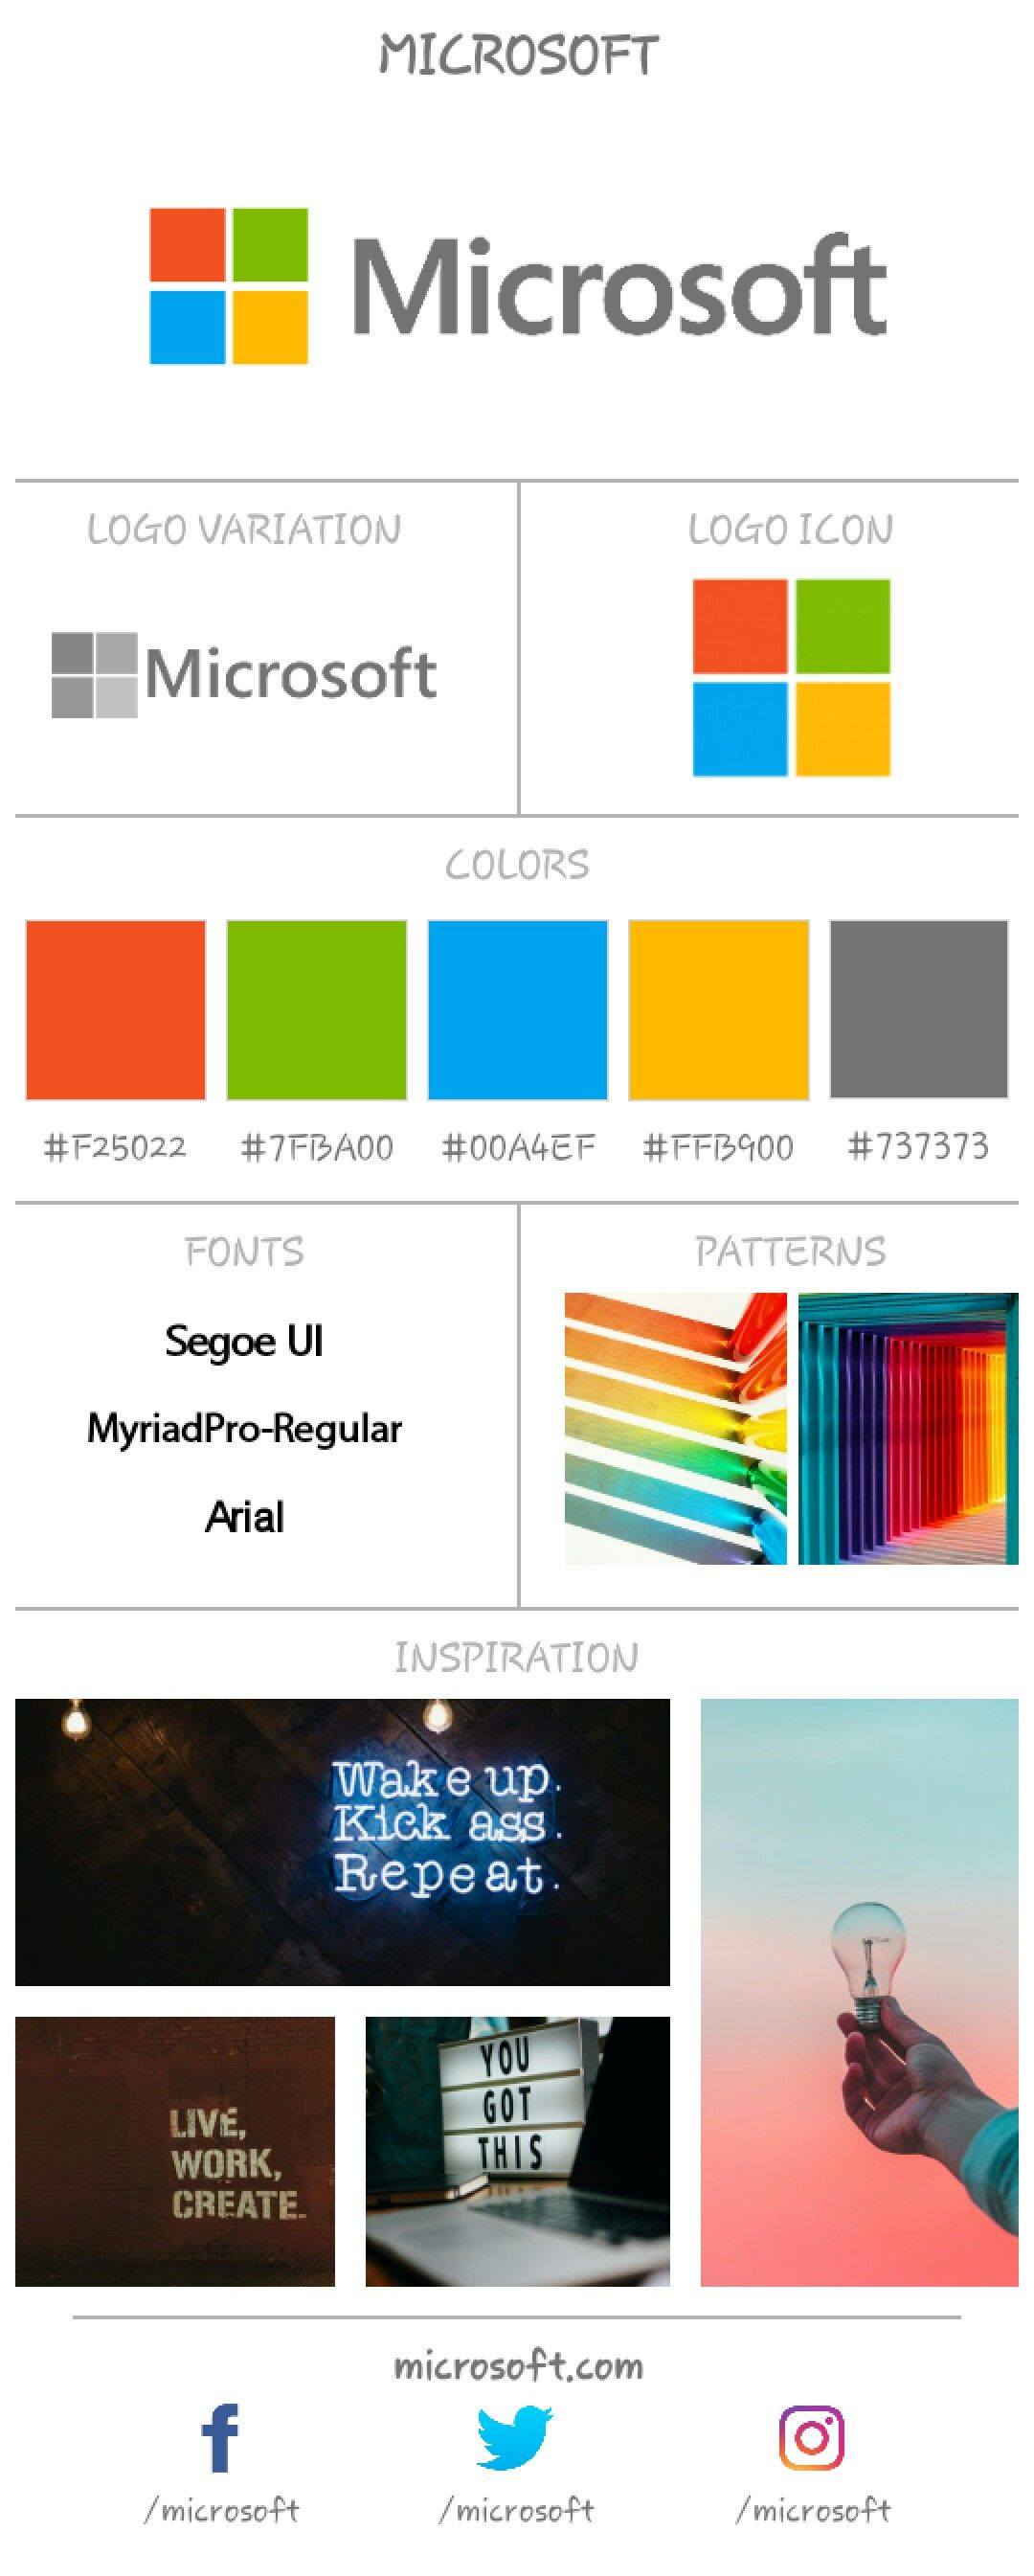 Microsoft Branding Board Using Branding Board App Microsoft Brandboard Branding Brand Android Brand Board Branding Microsoft